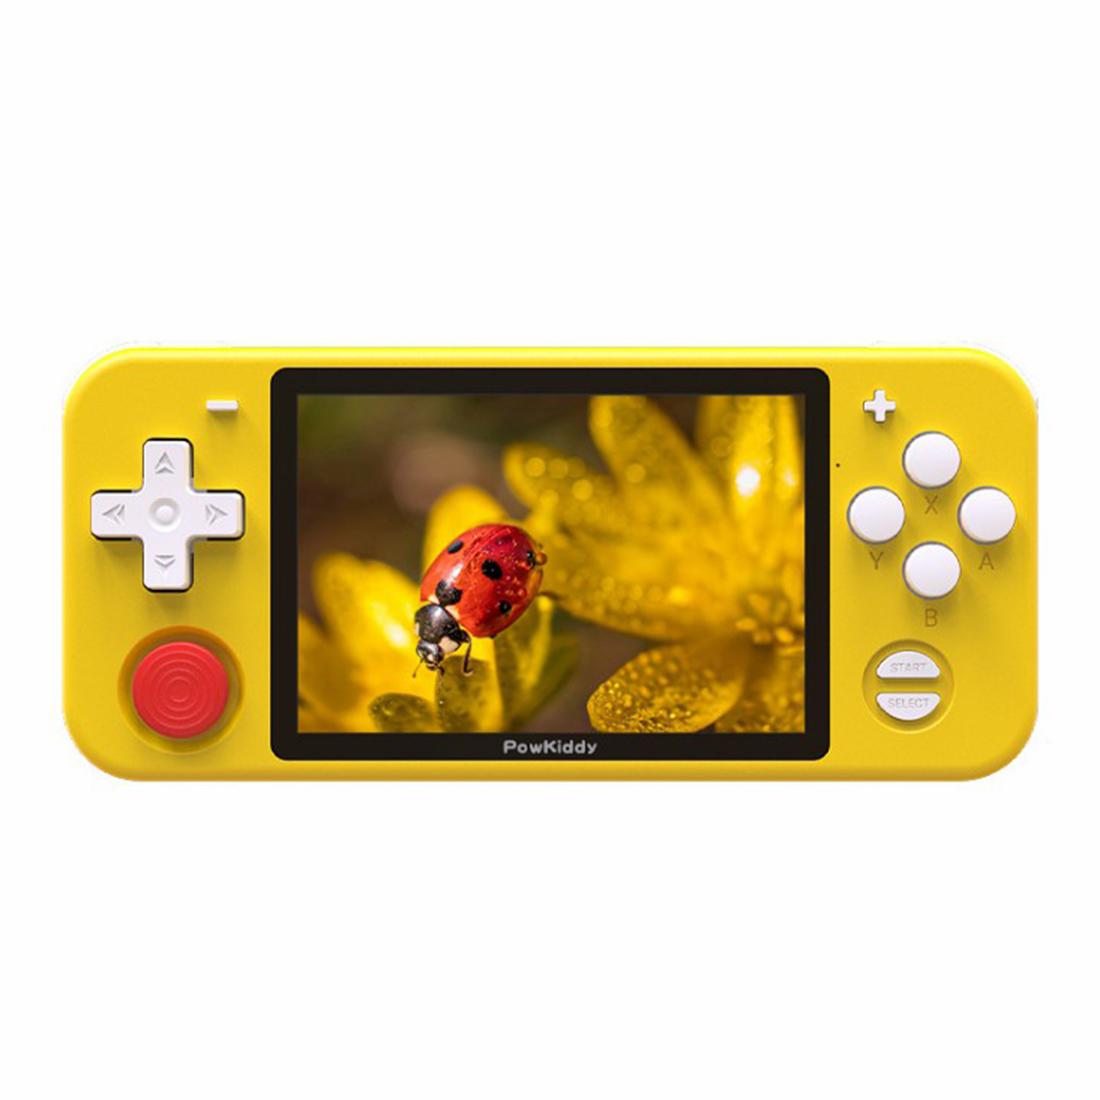 PowKiddy RGB10 Retro Emulation Handheld Game Console Open Source System Retro HD Game Machine